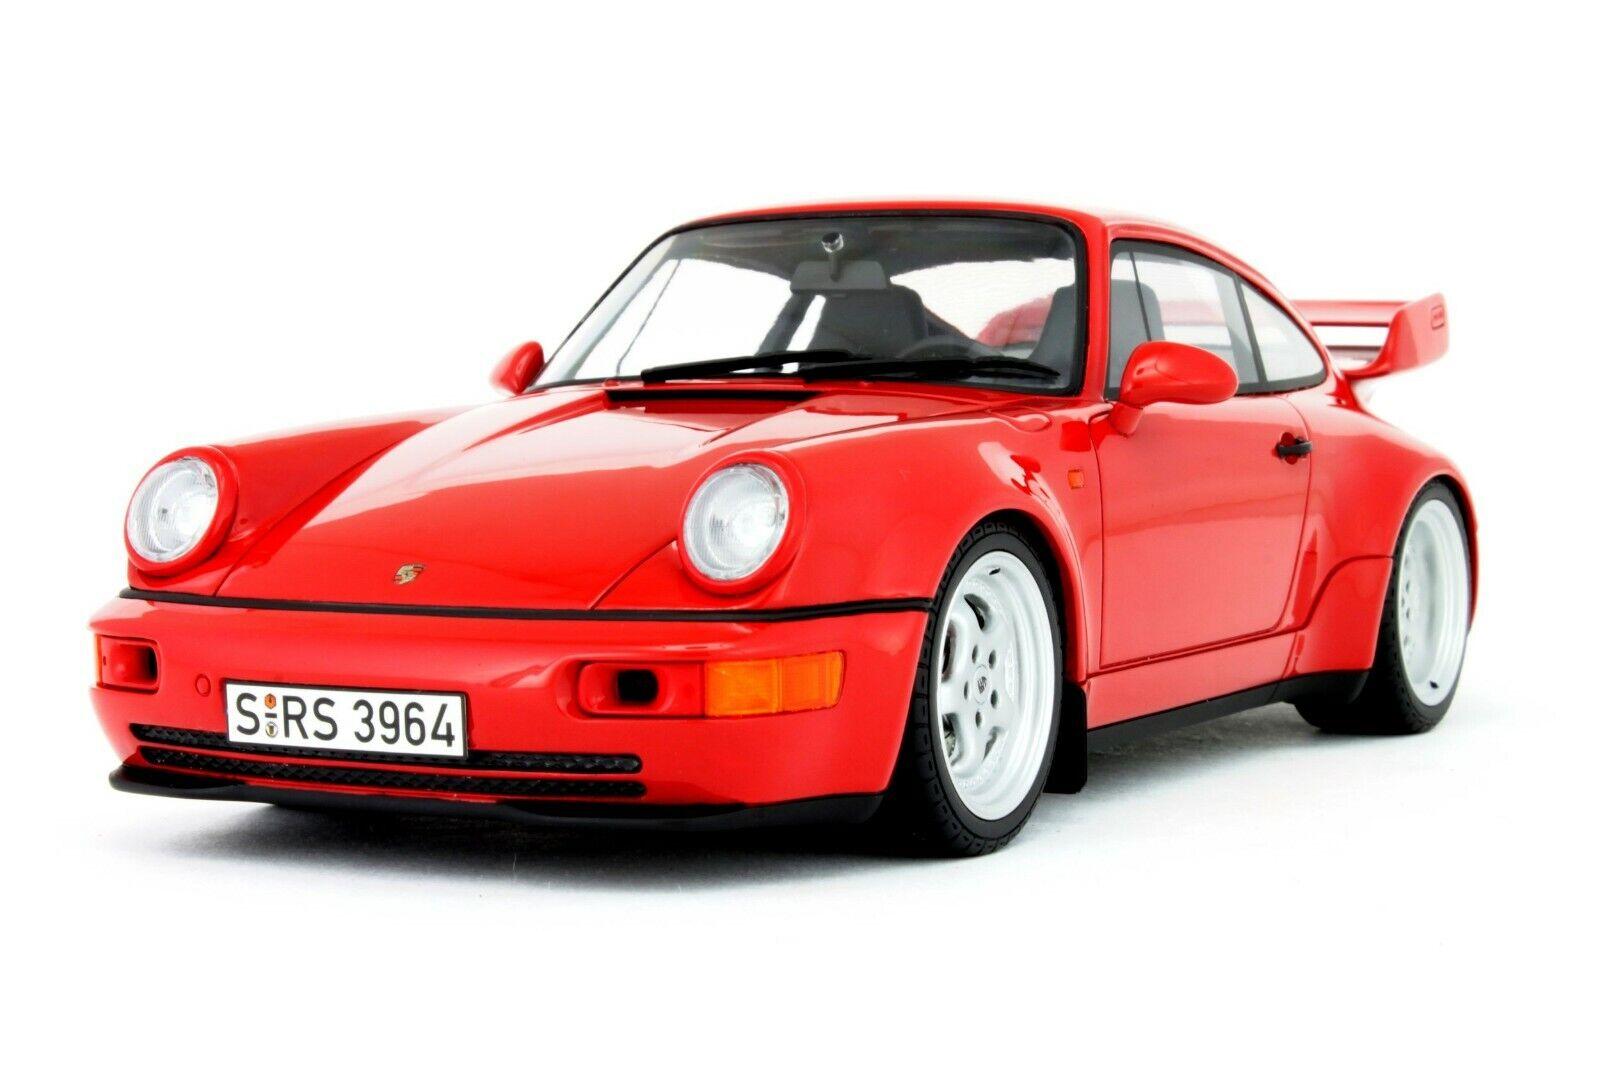 1 18 GT Spirit Porsche 911 (964) Carrera RS 3.8 (rosso) Limited 1500 pcs. FOAM BOX